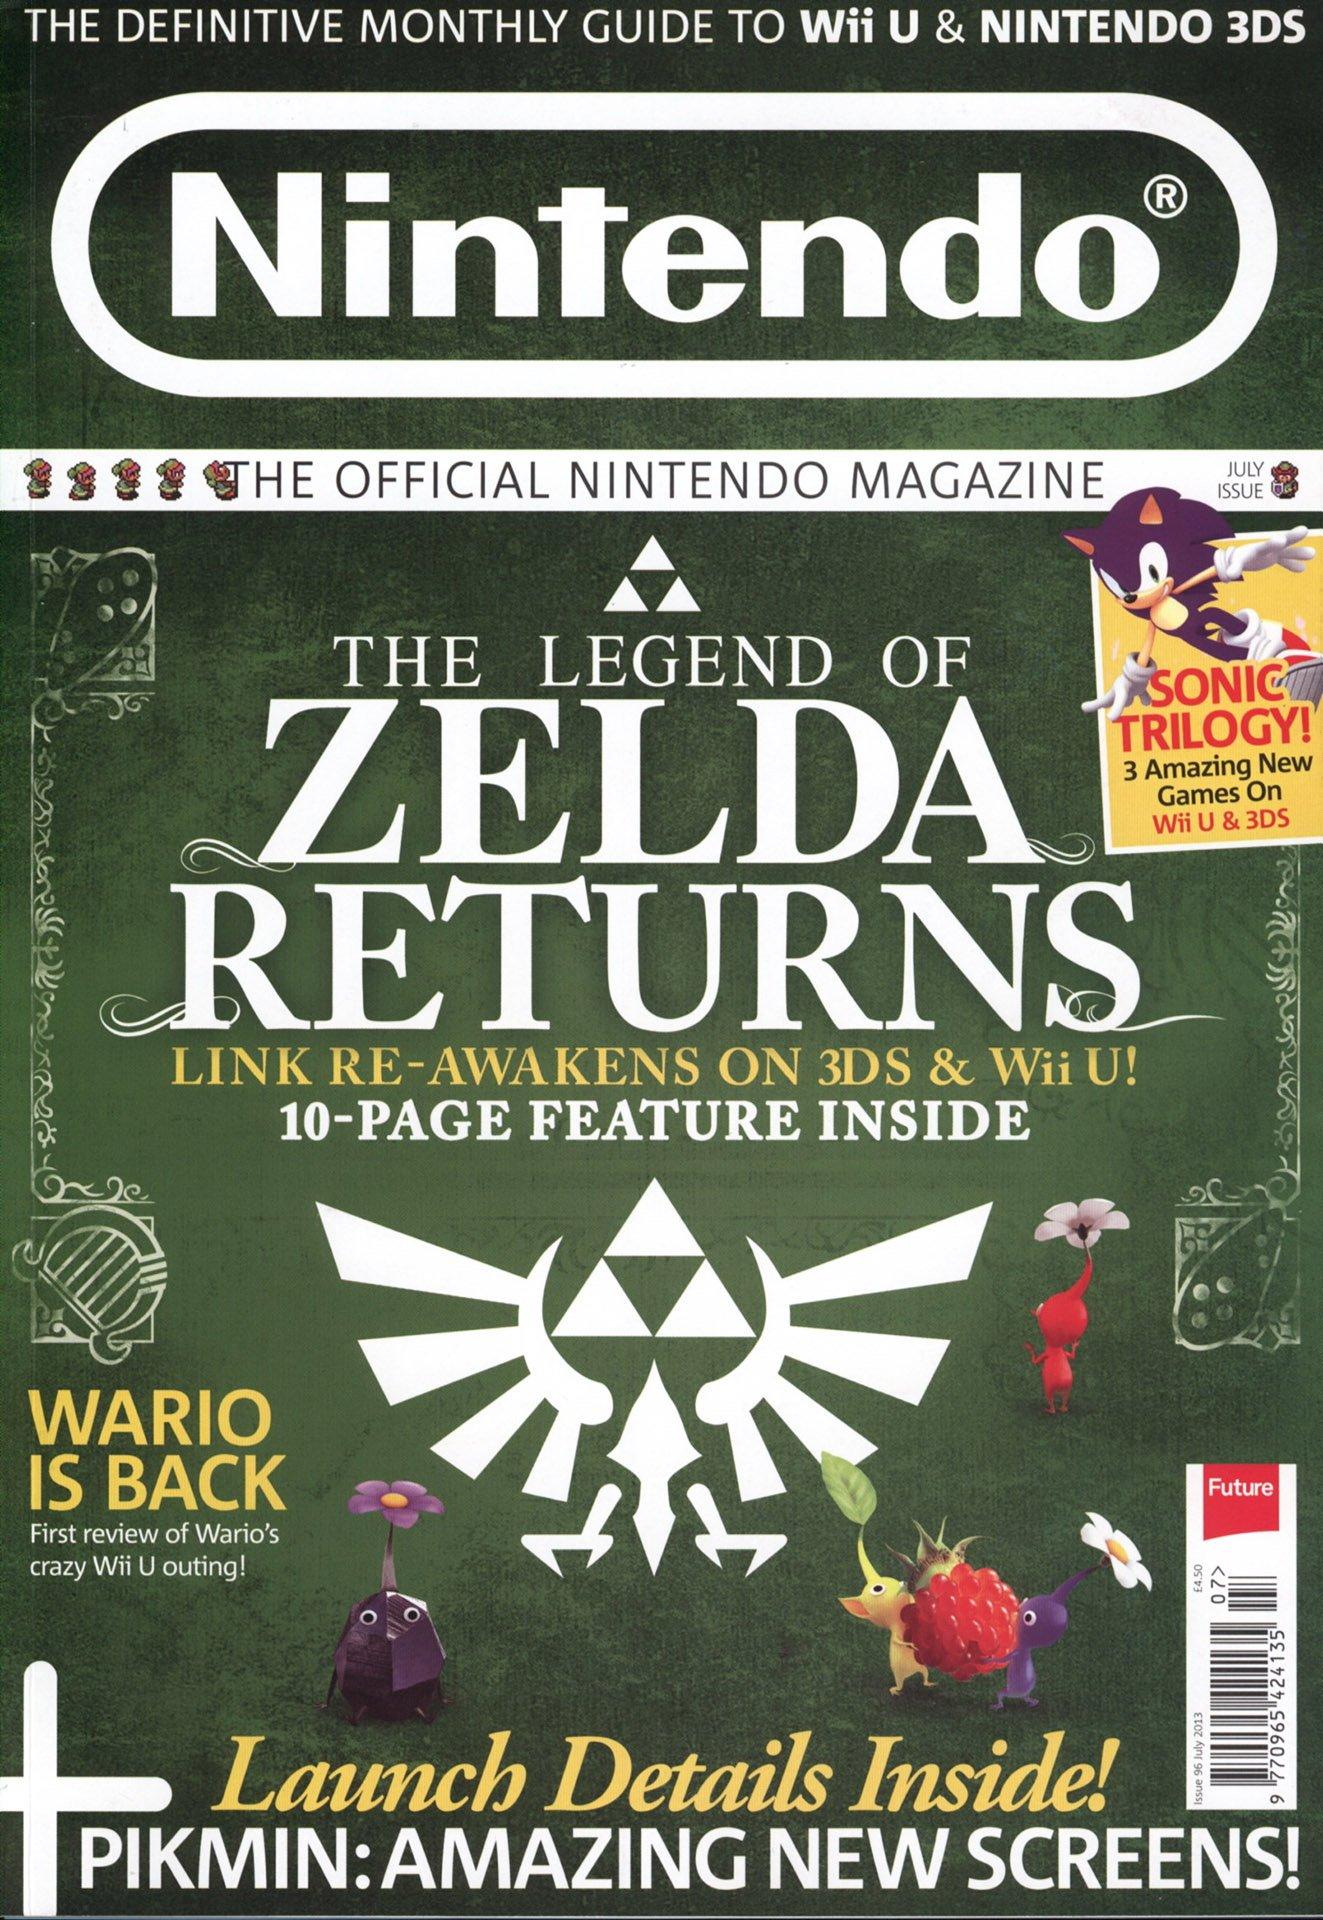 Official Nintendo Magazine 096 (July 2013)